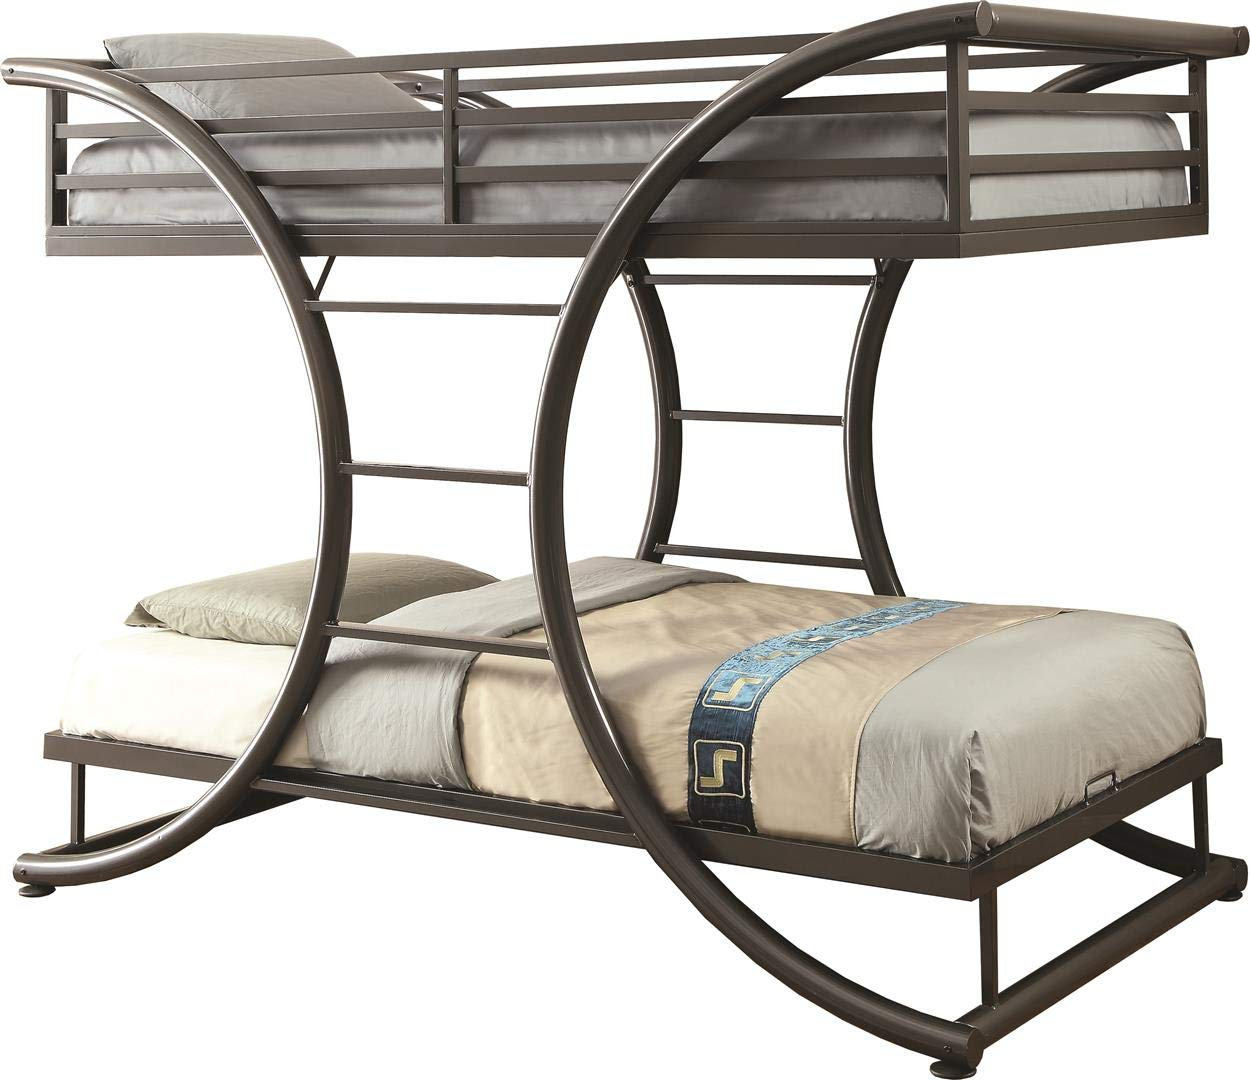 "Coaster Home Furnishings Bunk Bed, 82.25""W x 46""D x 65.25""H, Dark Gunmetal"